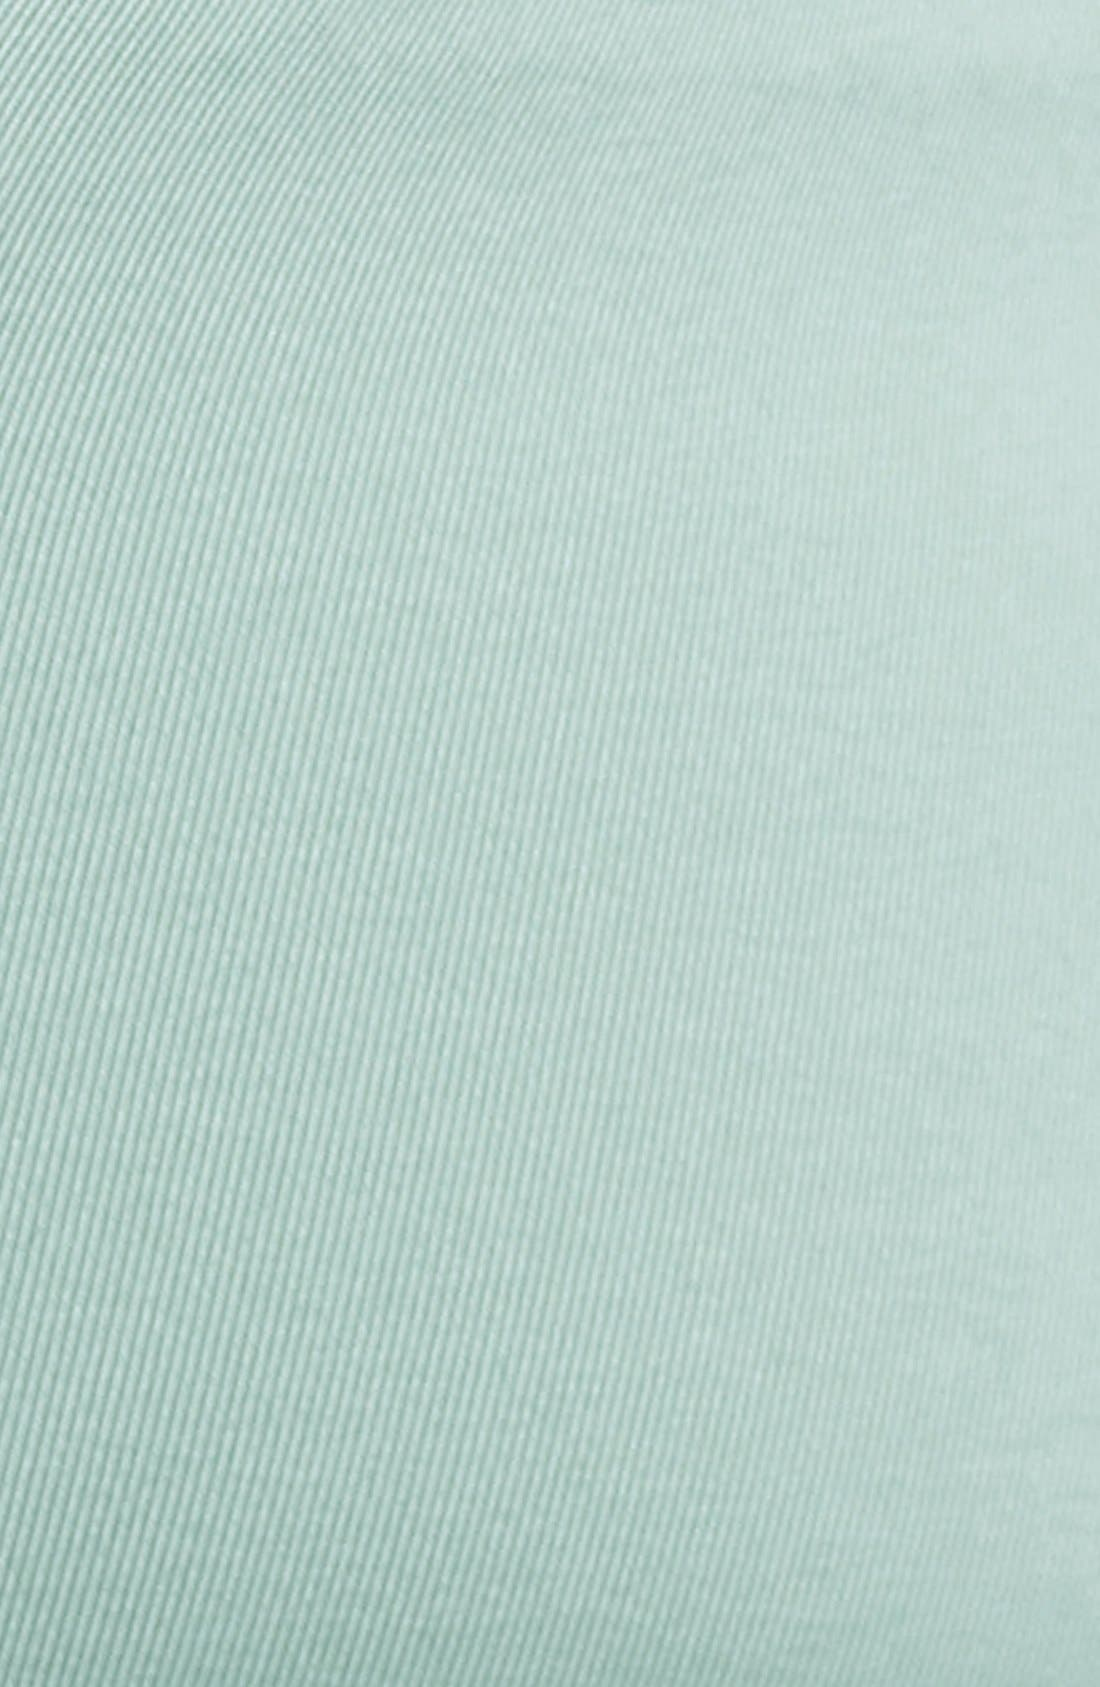 Alternate Image 3  - Calvin Klein 'Seductive Comfort - Customized Lift' Underwire Bra (Online Only)